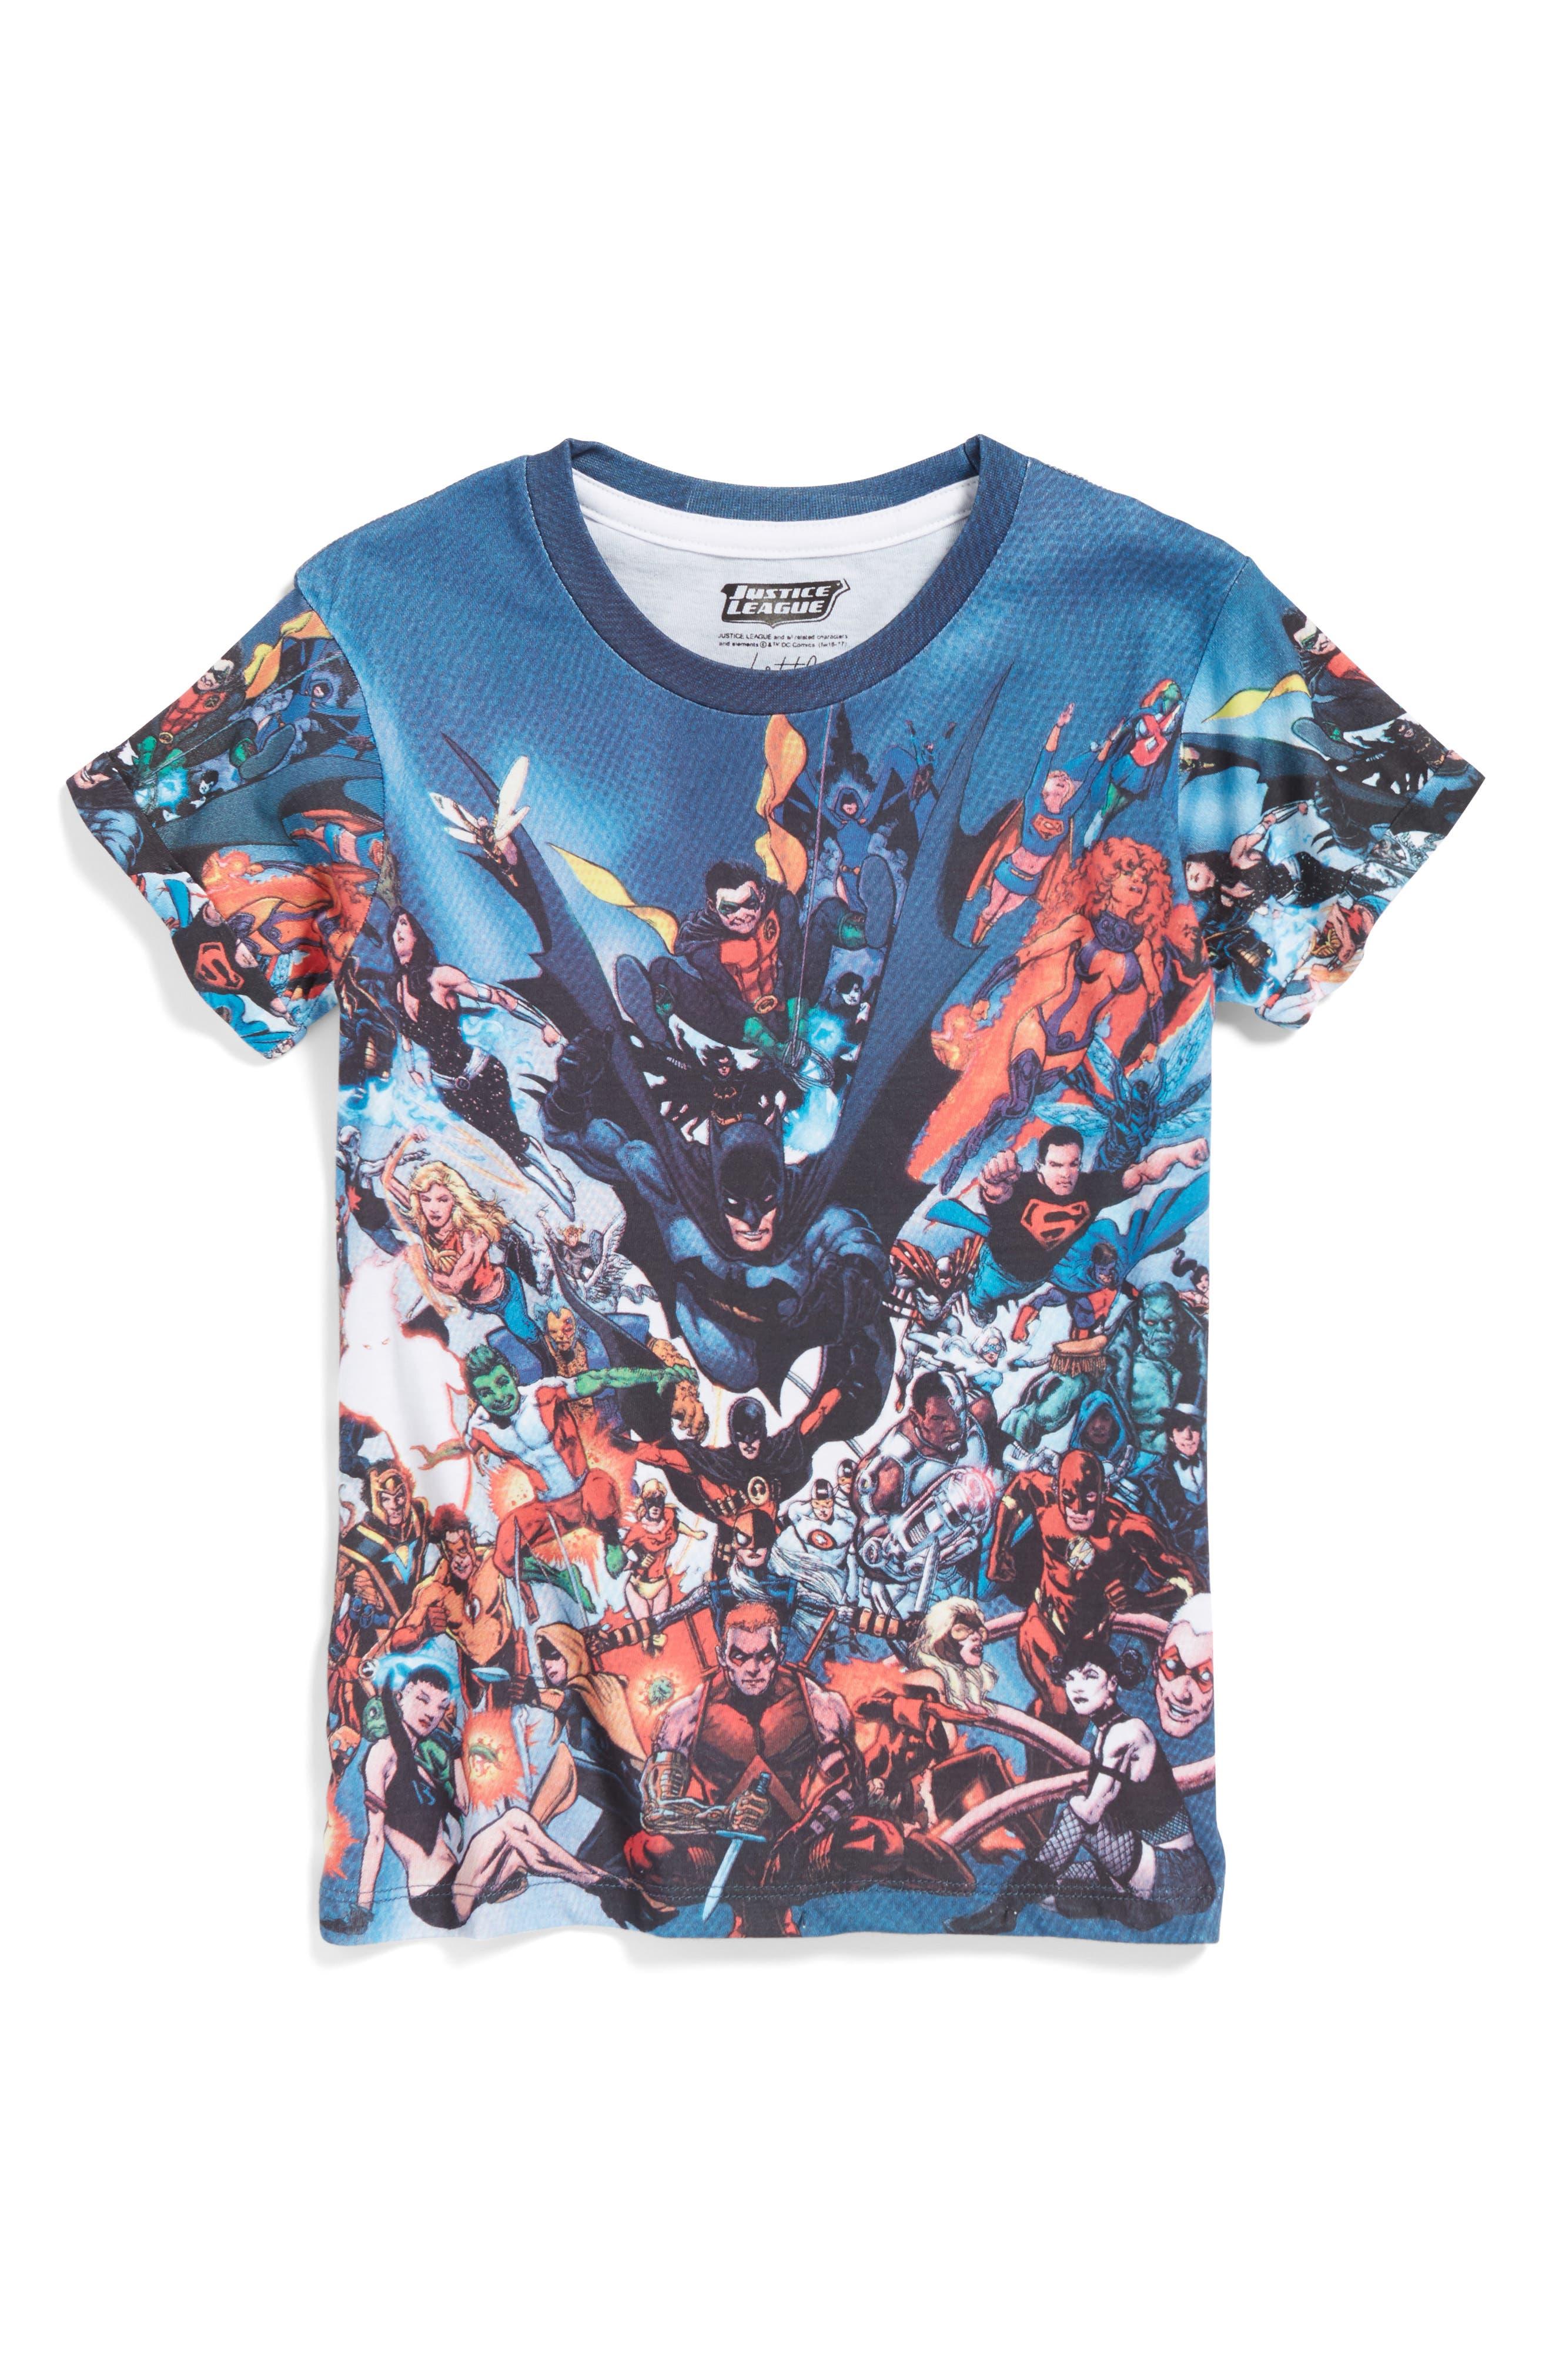 Justice League Superhero T-Shirt,                         Main,                         color, Multi